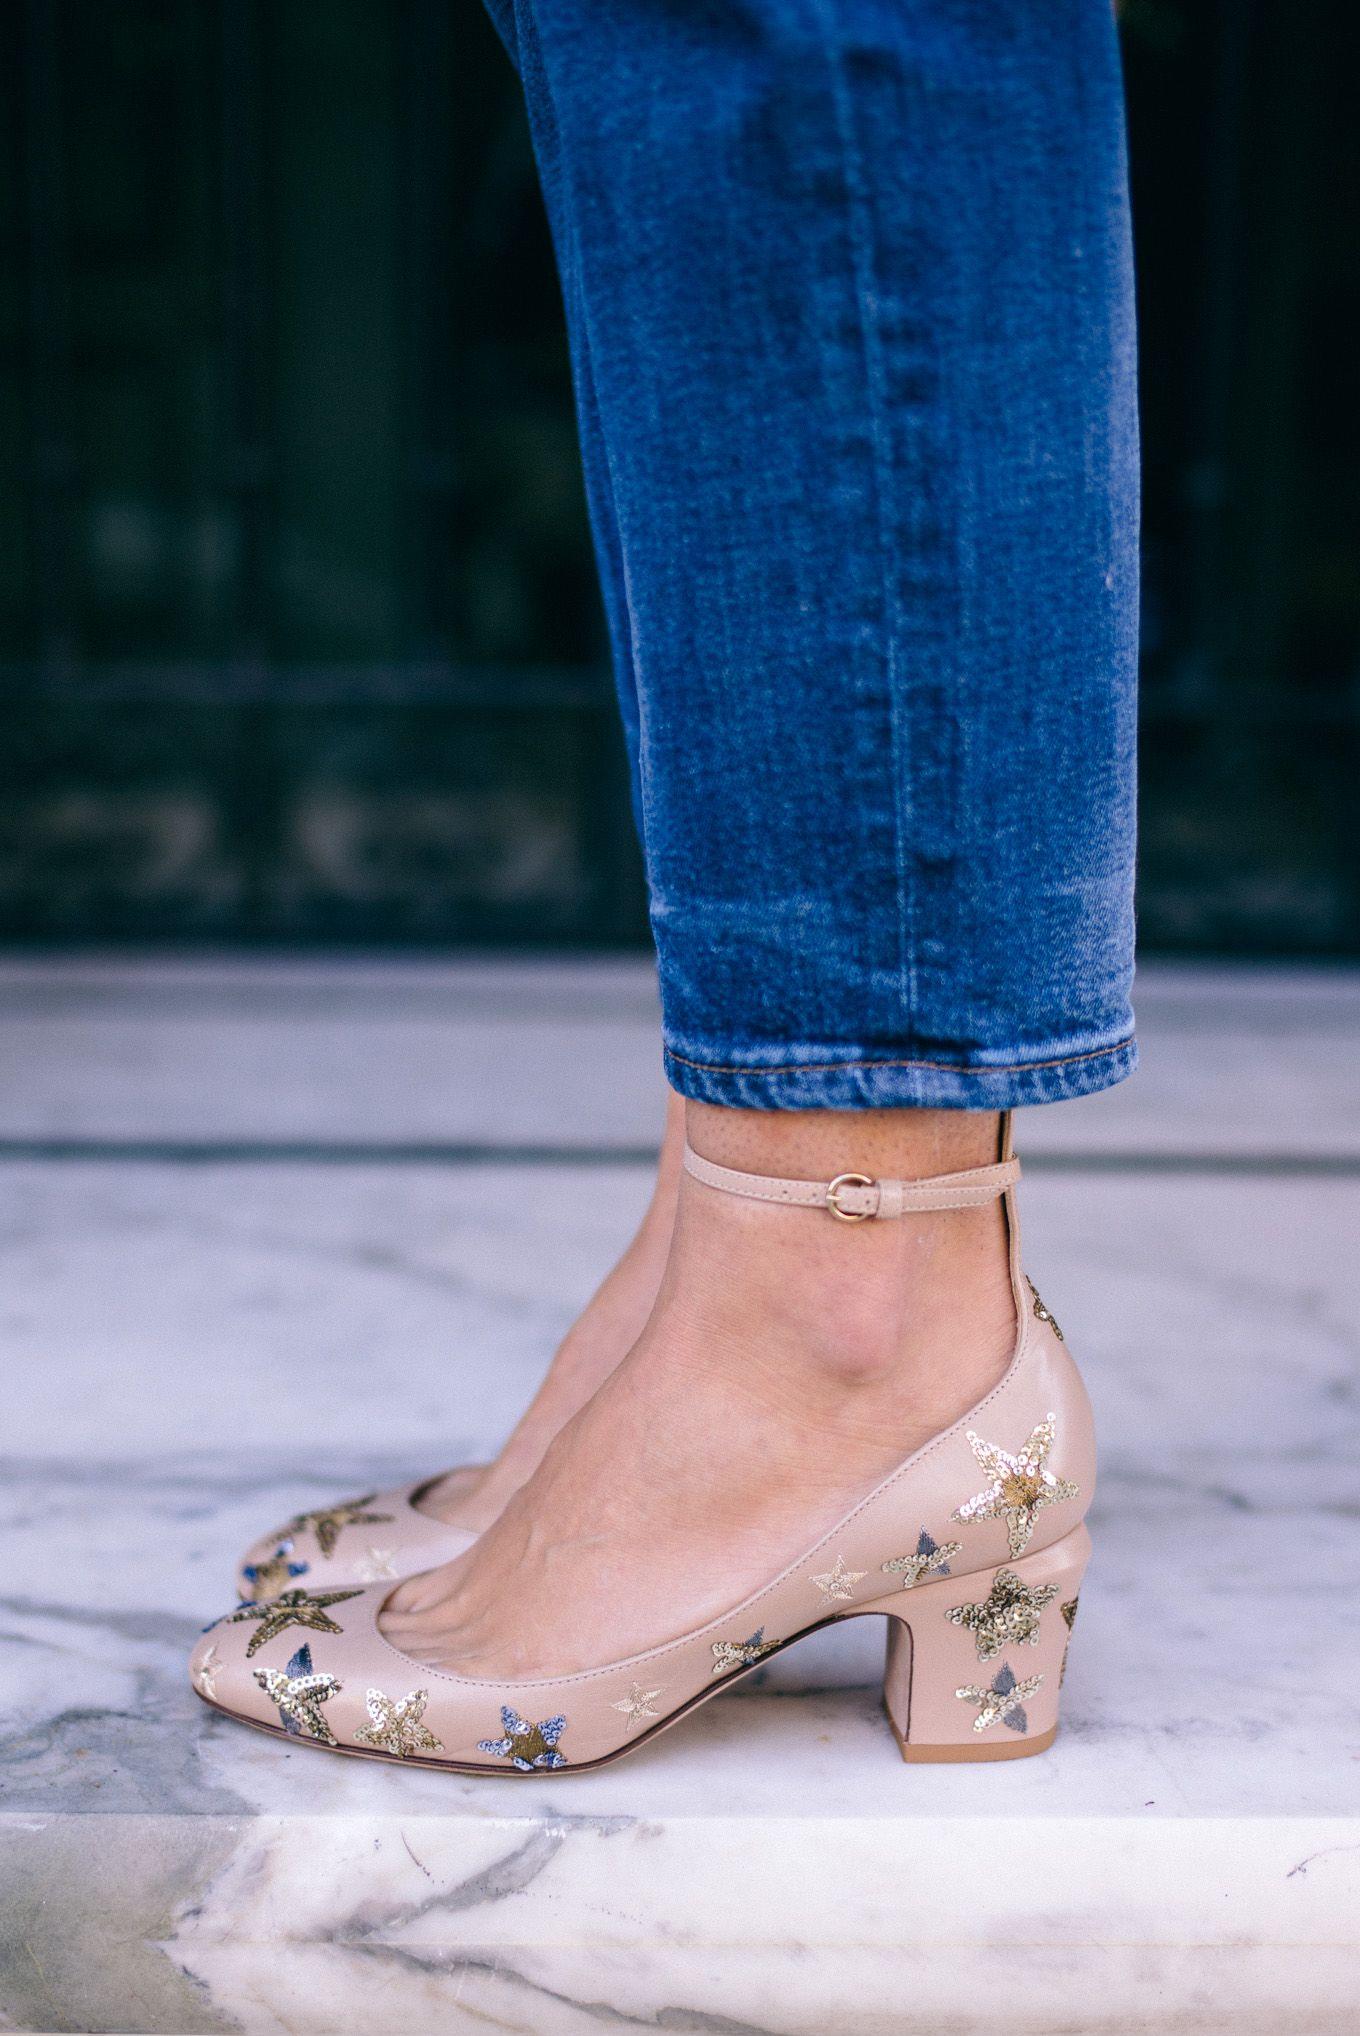 3b8aae72d7c8 Gal Meets Glam Gold Sequin Blazer + Edie Parker Clutch Giveaway - J.Crew  jeans   Valentino pumps